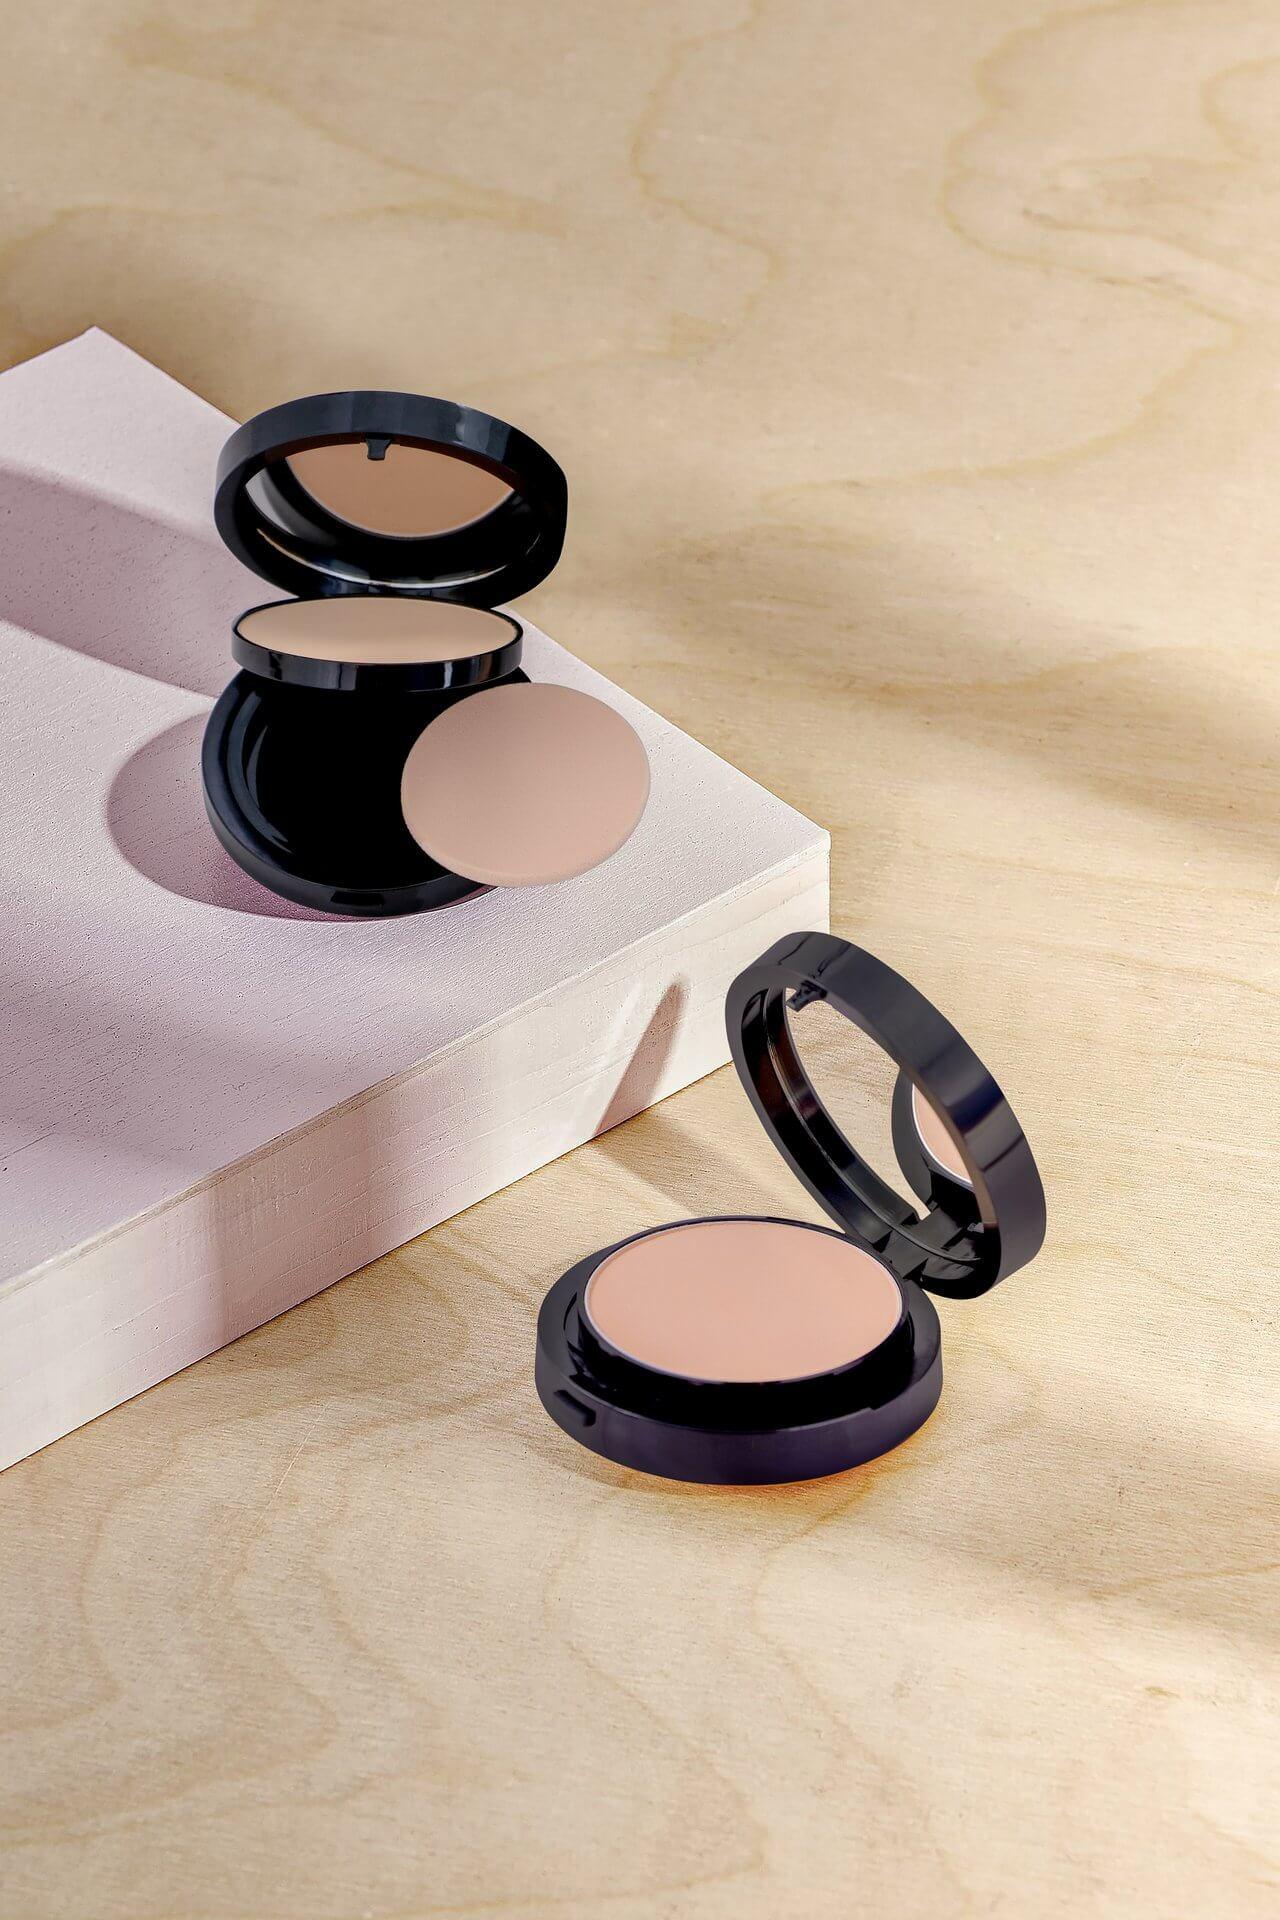 PEXELS.COM/Venus HD Make-up & Perfume